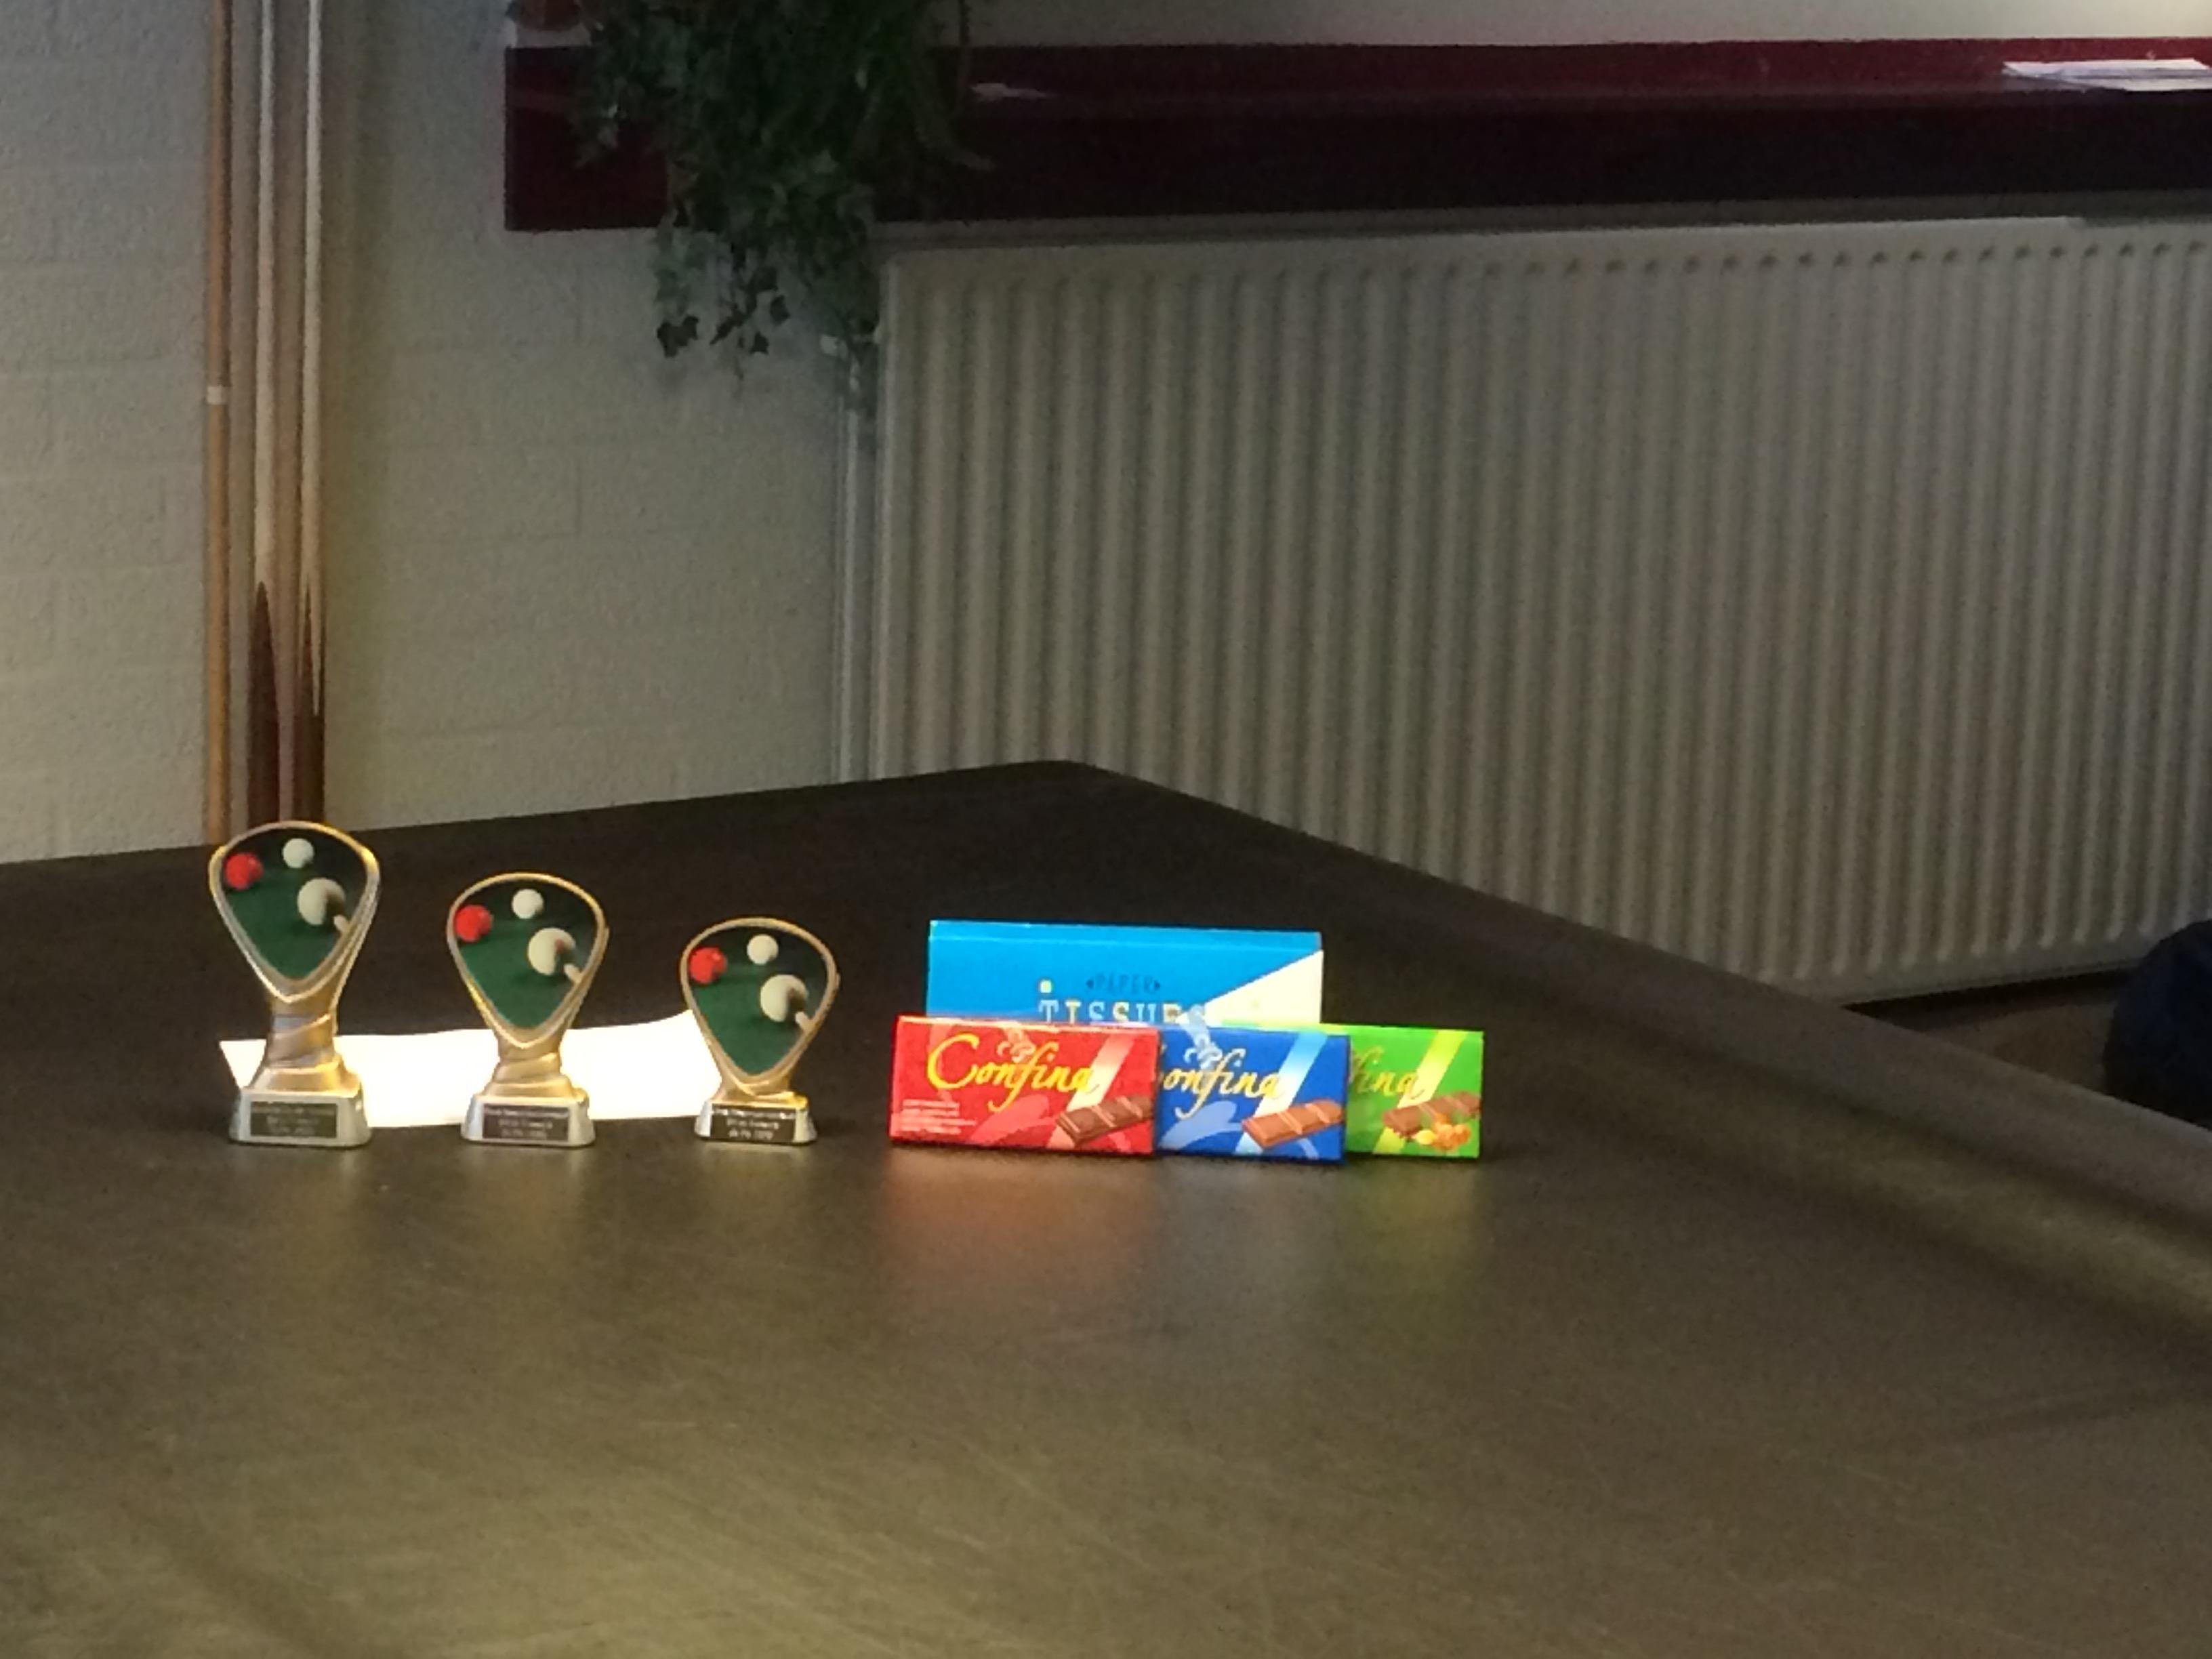 Openbandstoot toernooi 2015 - 1